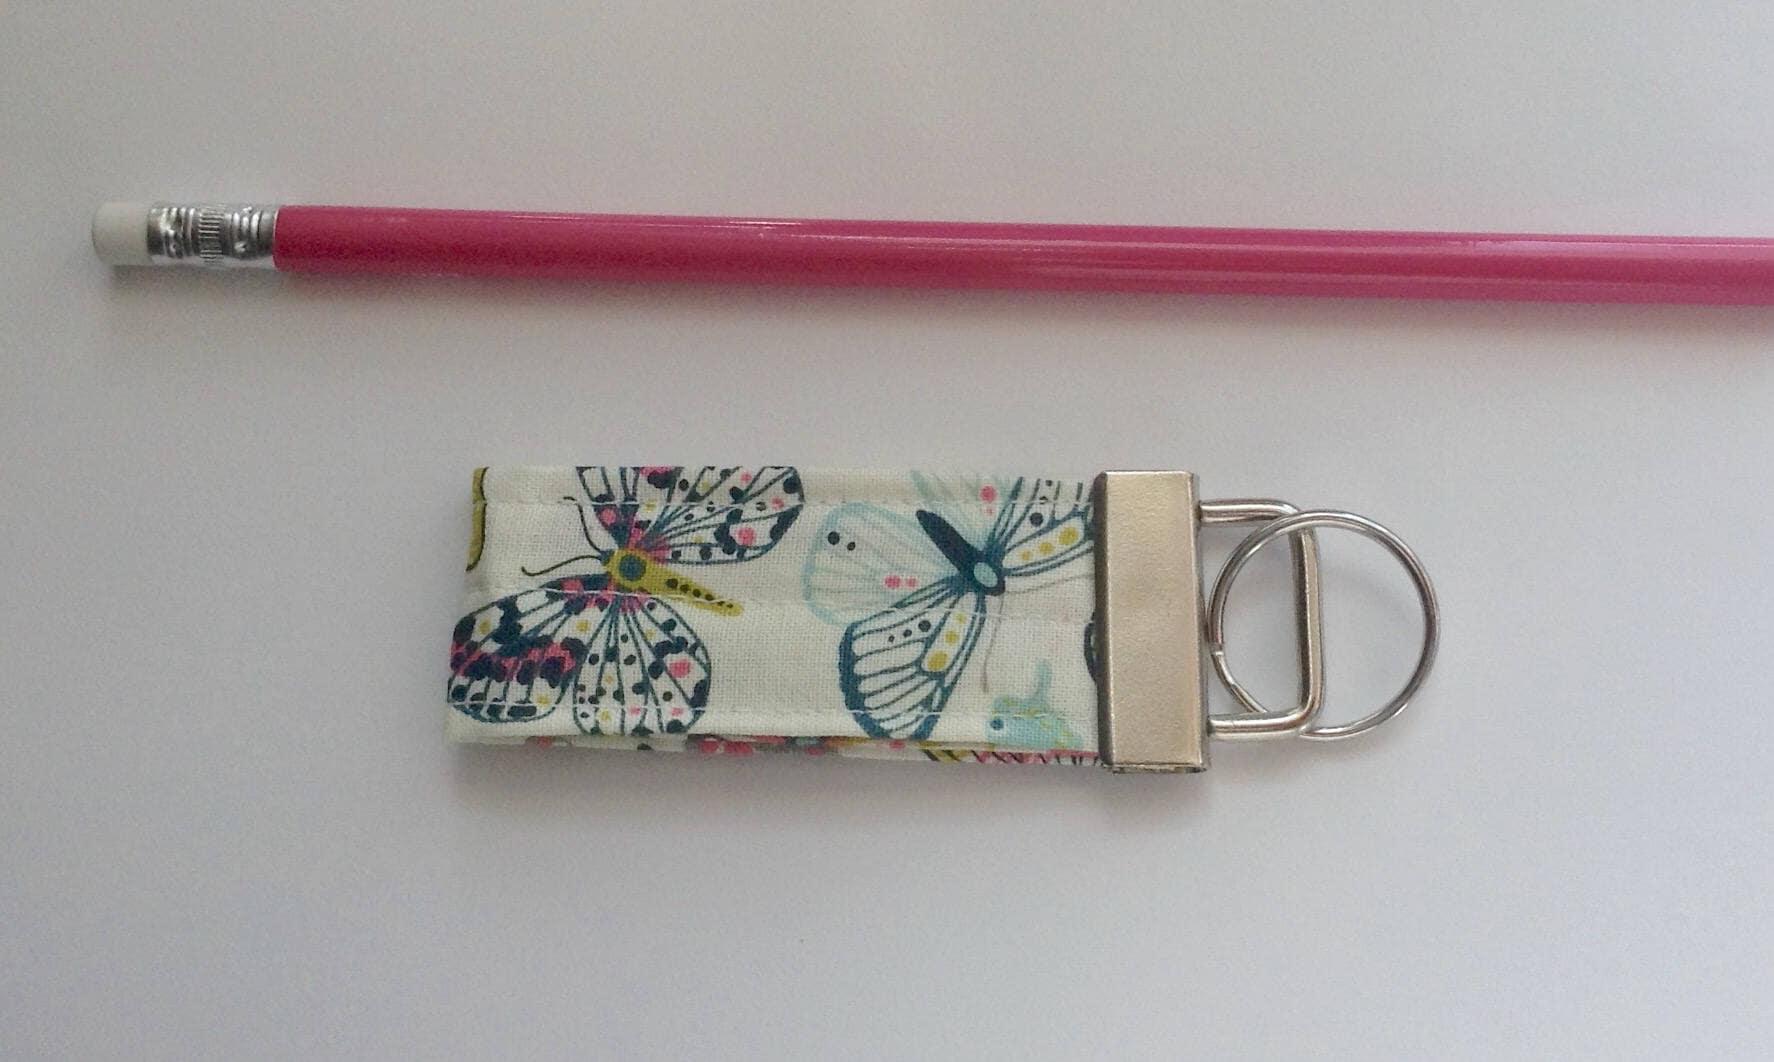 Mini keychain key fob key ring fabric keychain women s girls accessories-  butterfly print fabric 96c88b427